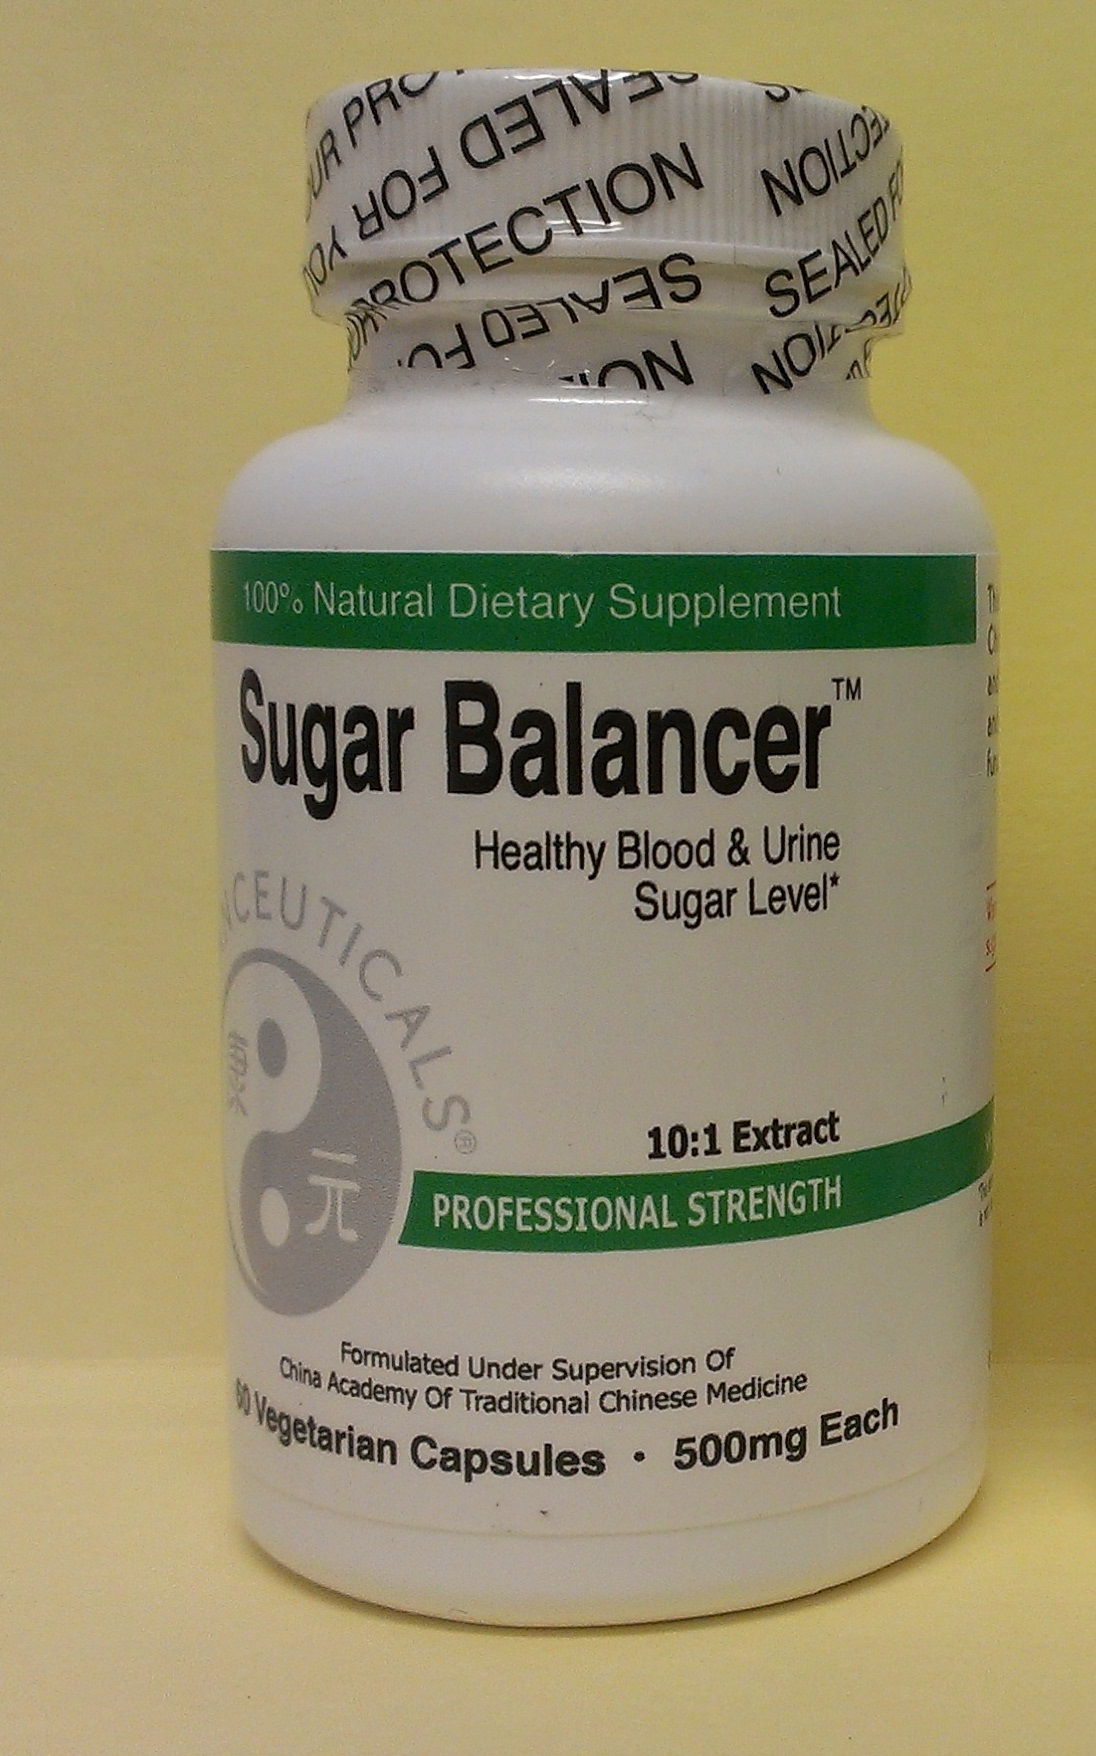 File:Illegally Sold Diabetes Treatments - Sugar Balancer